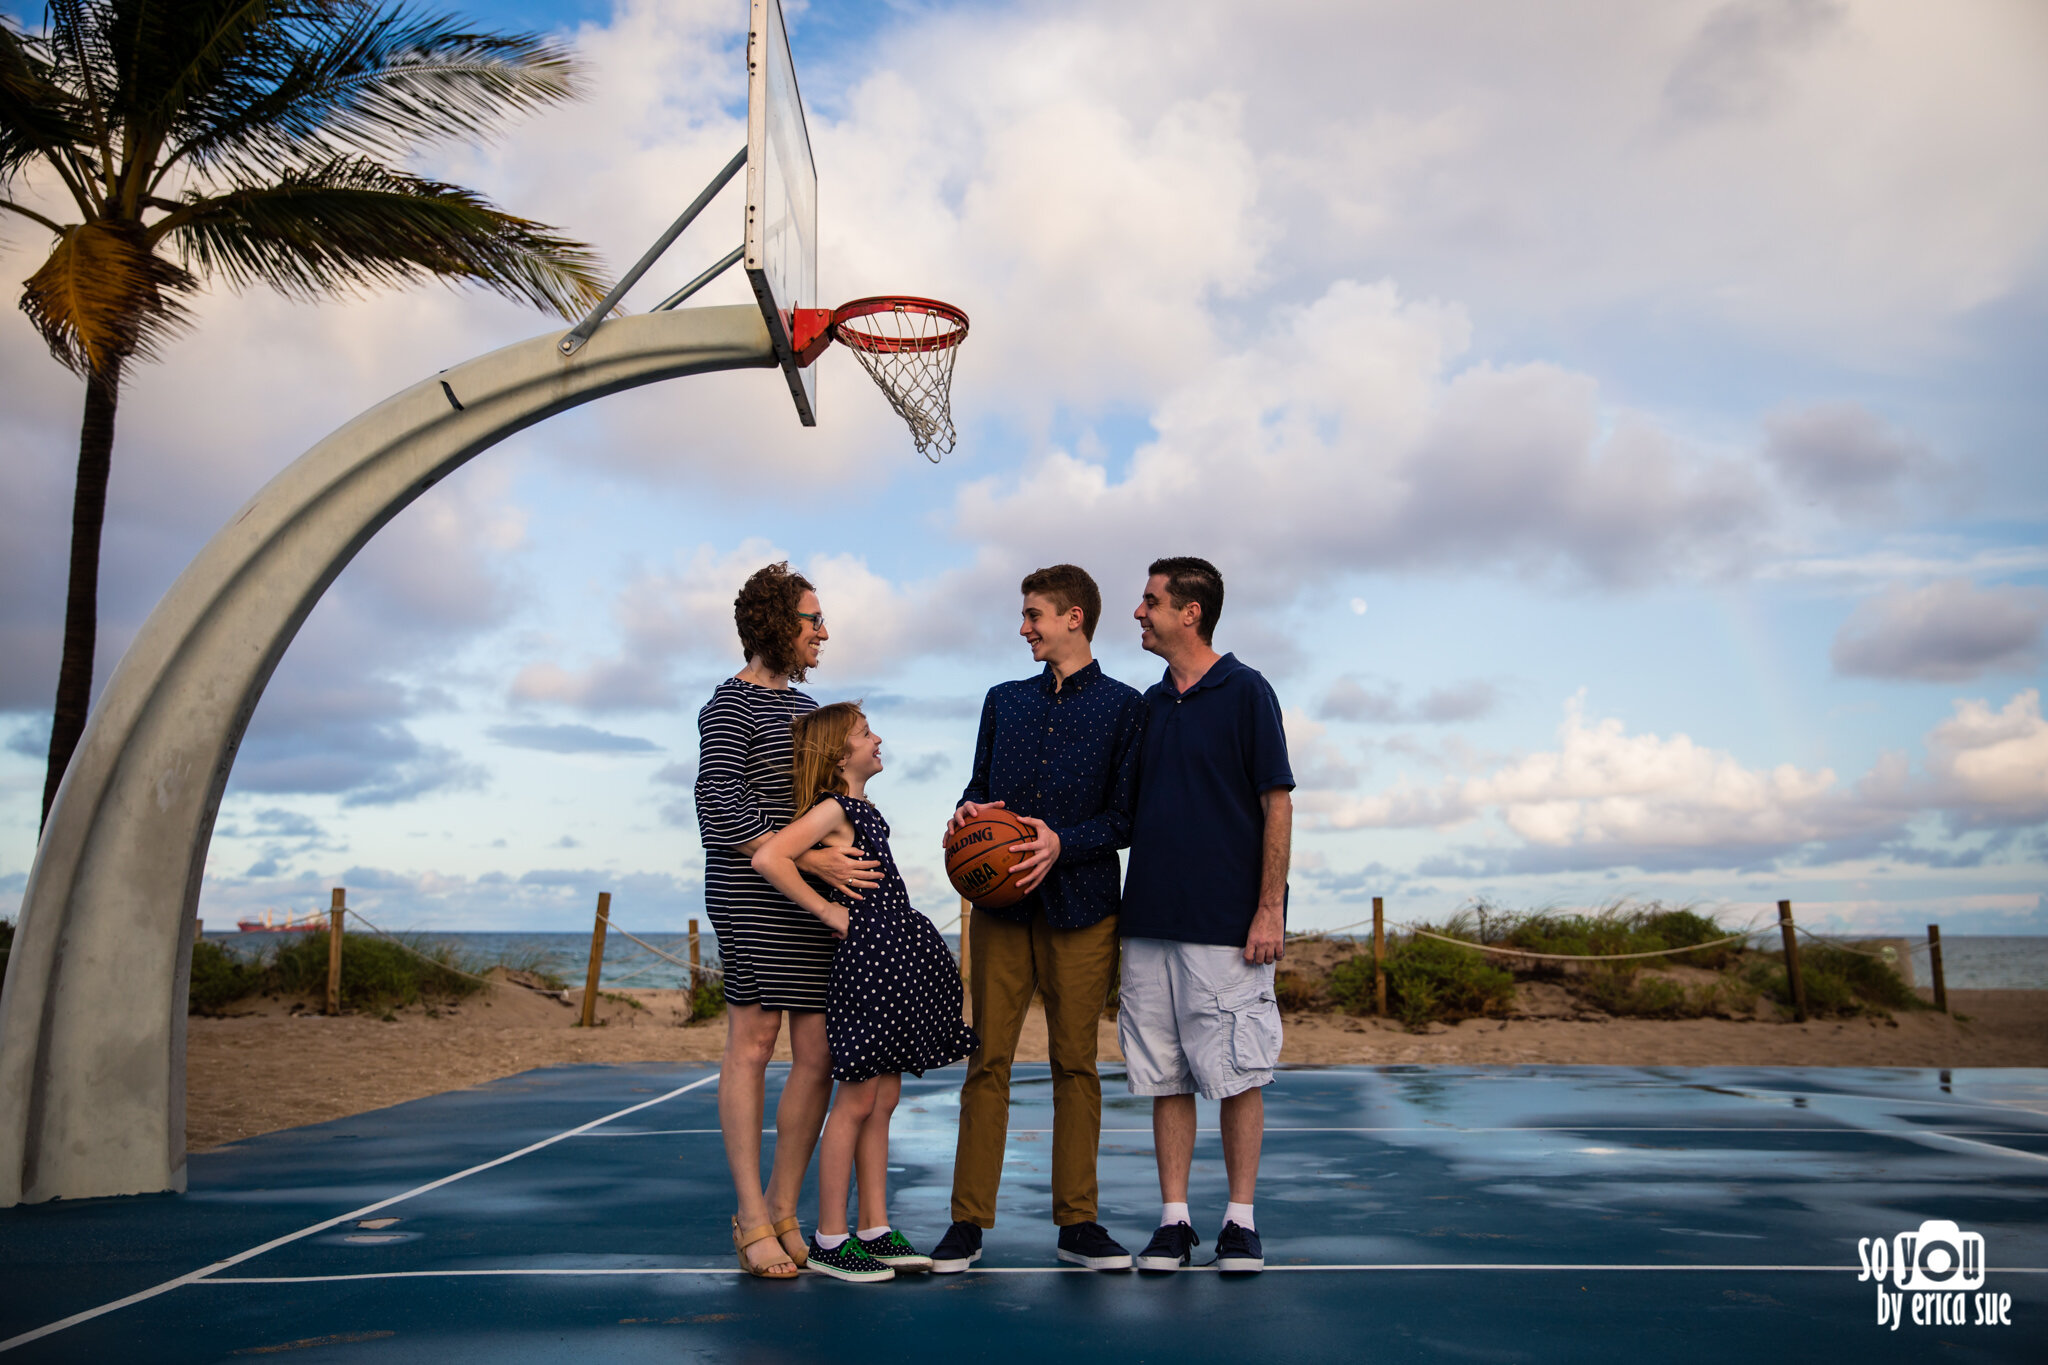 so-you-by-erica-sue-ft-lauderdale-beach-basketball-mitzvah-pre-shoot-9522.JPG